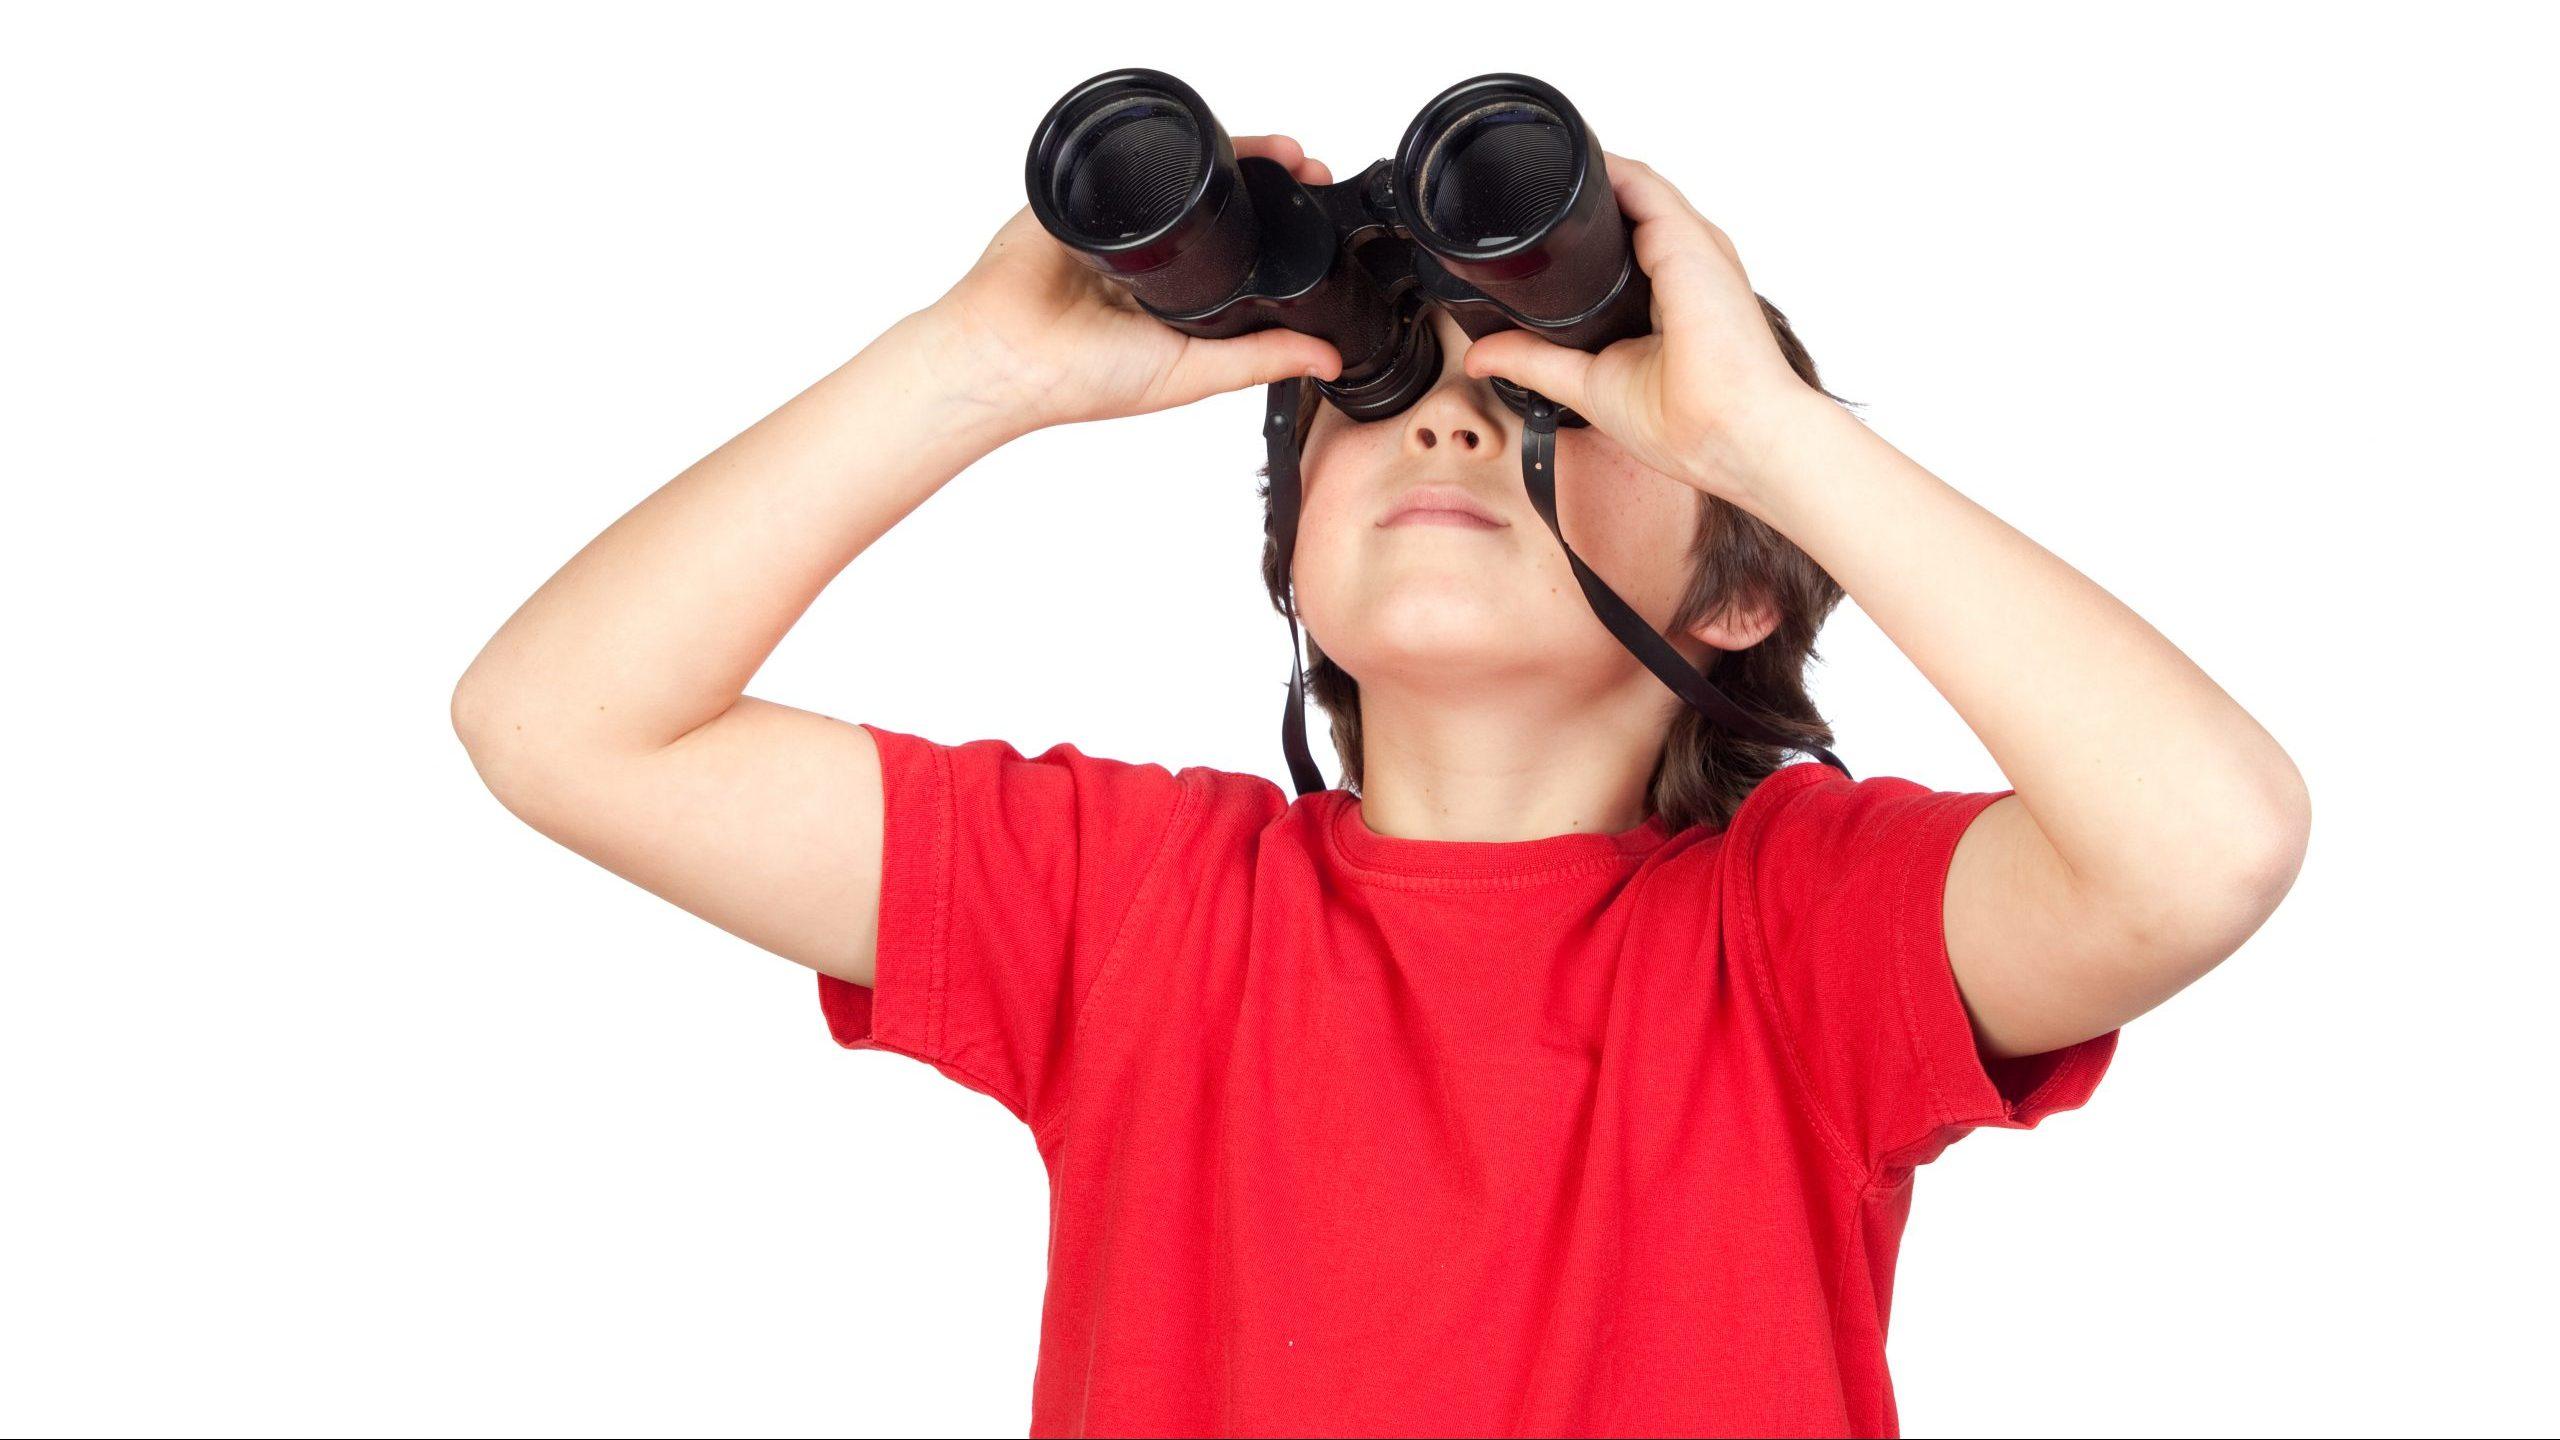 A boy in a red shirt looking through binoculars